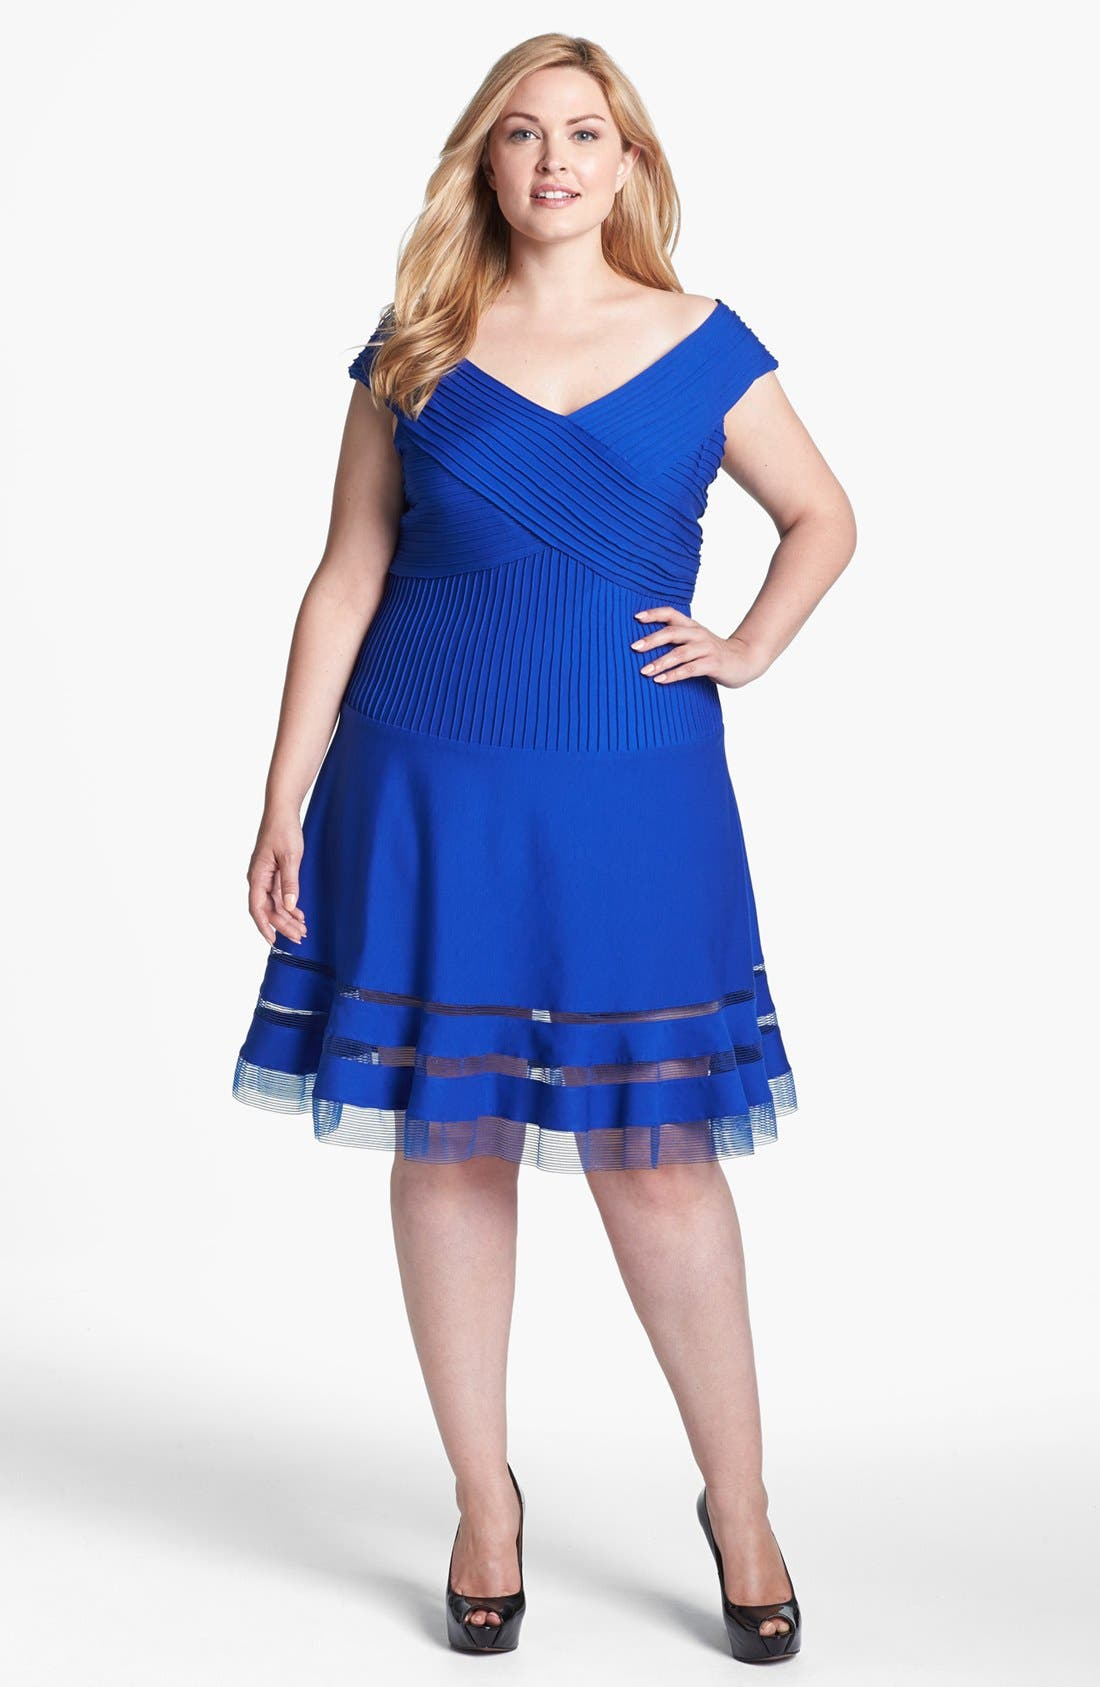 Alternate Image 1 Selected - Tadashi Shoji V-Neck Tulle Hem Fit & Flare Dress (Plus Size)